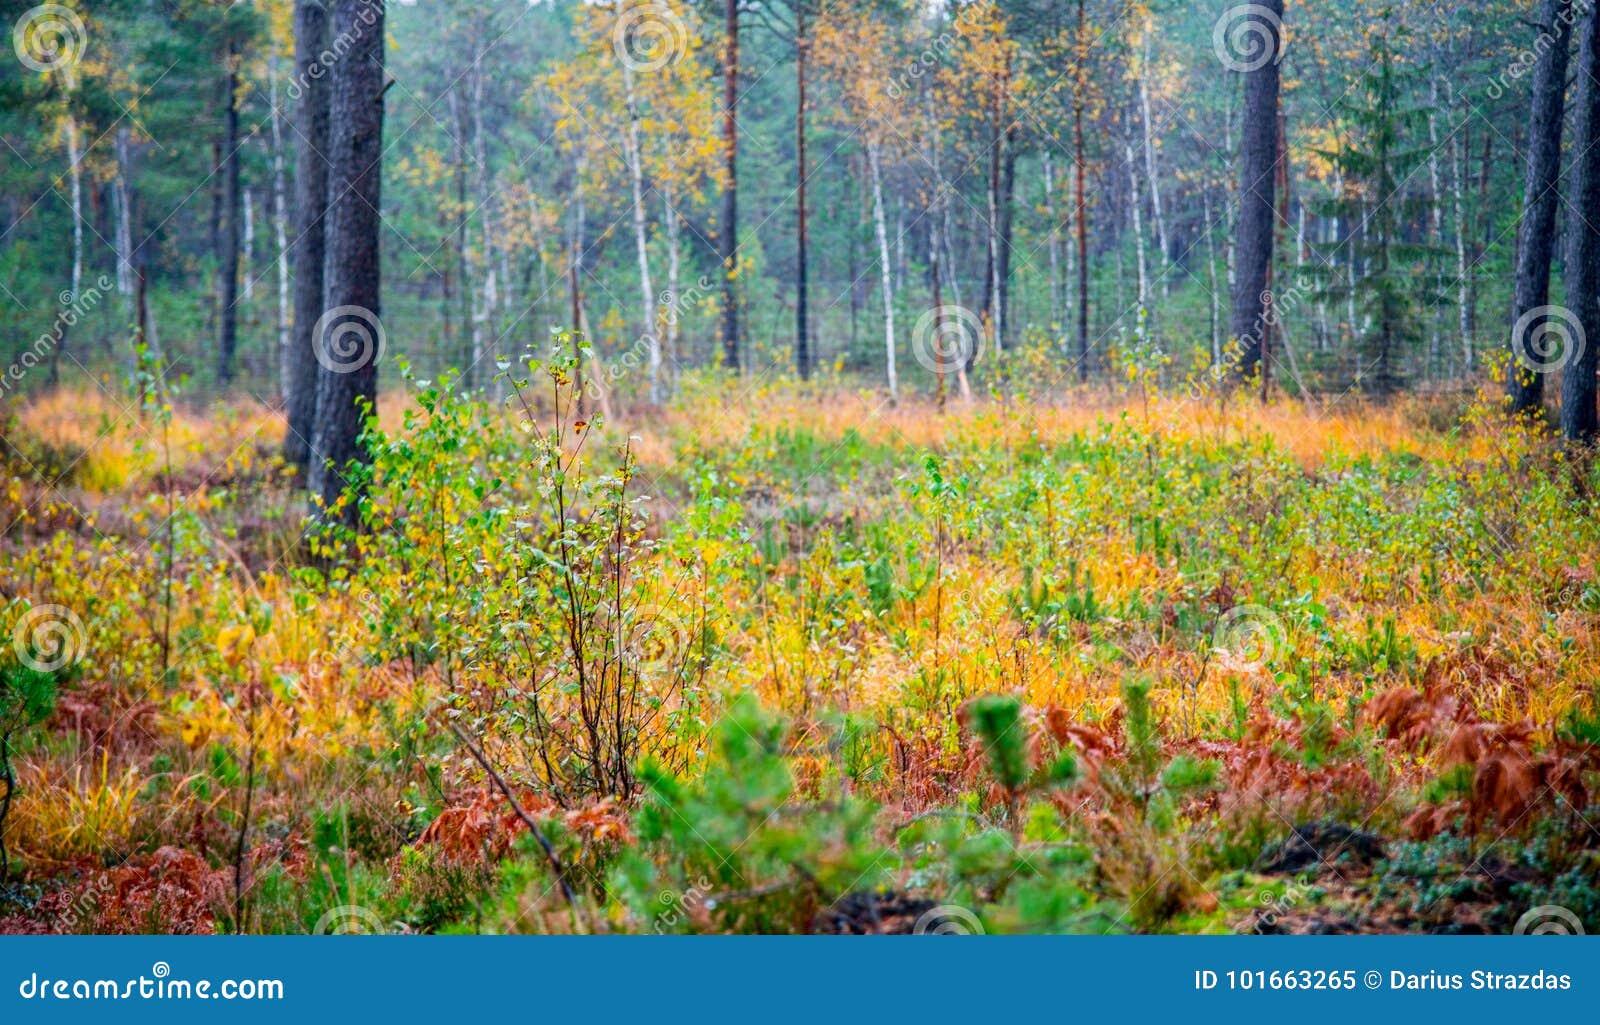 Fall nature colors stock image. Image of lithuania, fall - 101663265